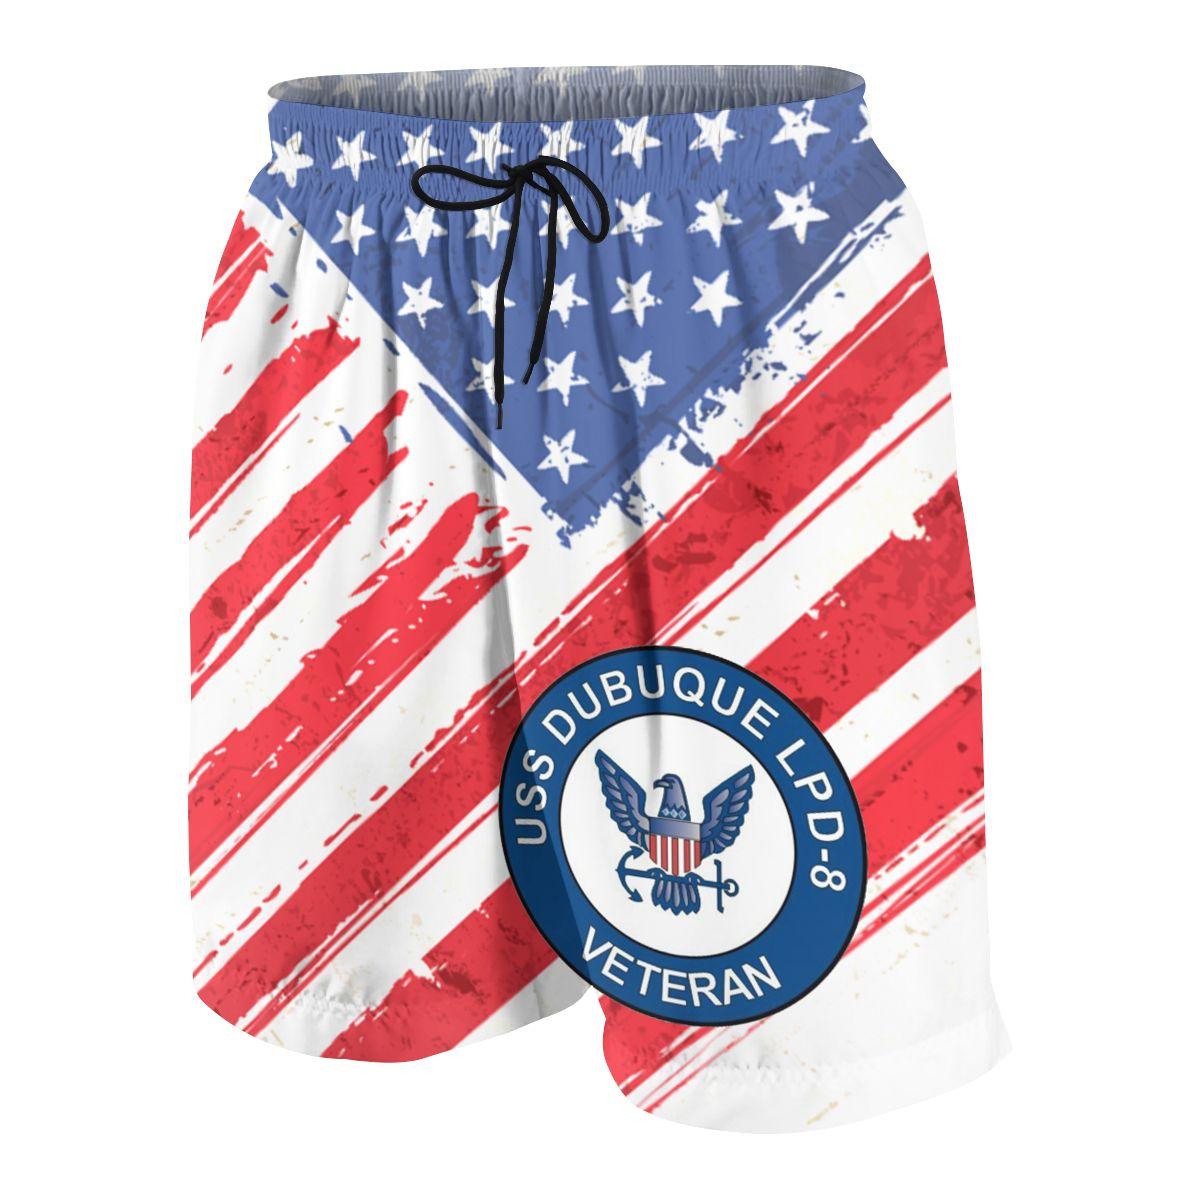 US Navy USS Dubuque LPD-8 Ship Veteran Sports Shorts Teen Summer Skinny Casual Beach Short Pants Jogger Fitness Sweatpants